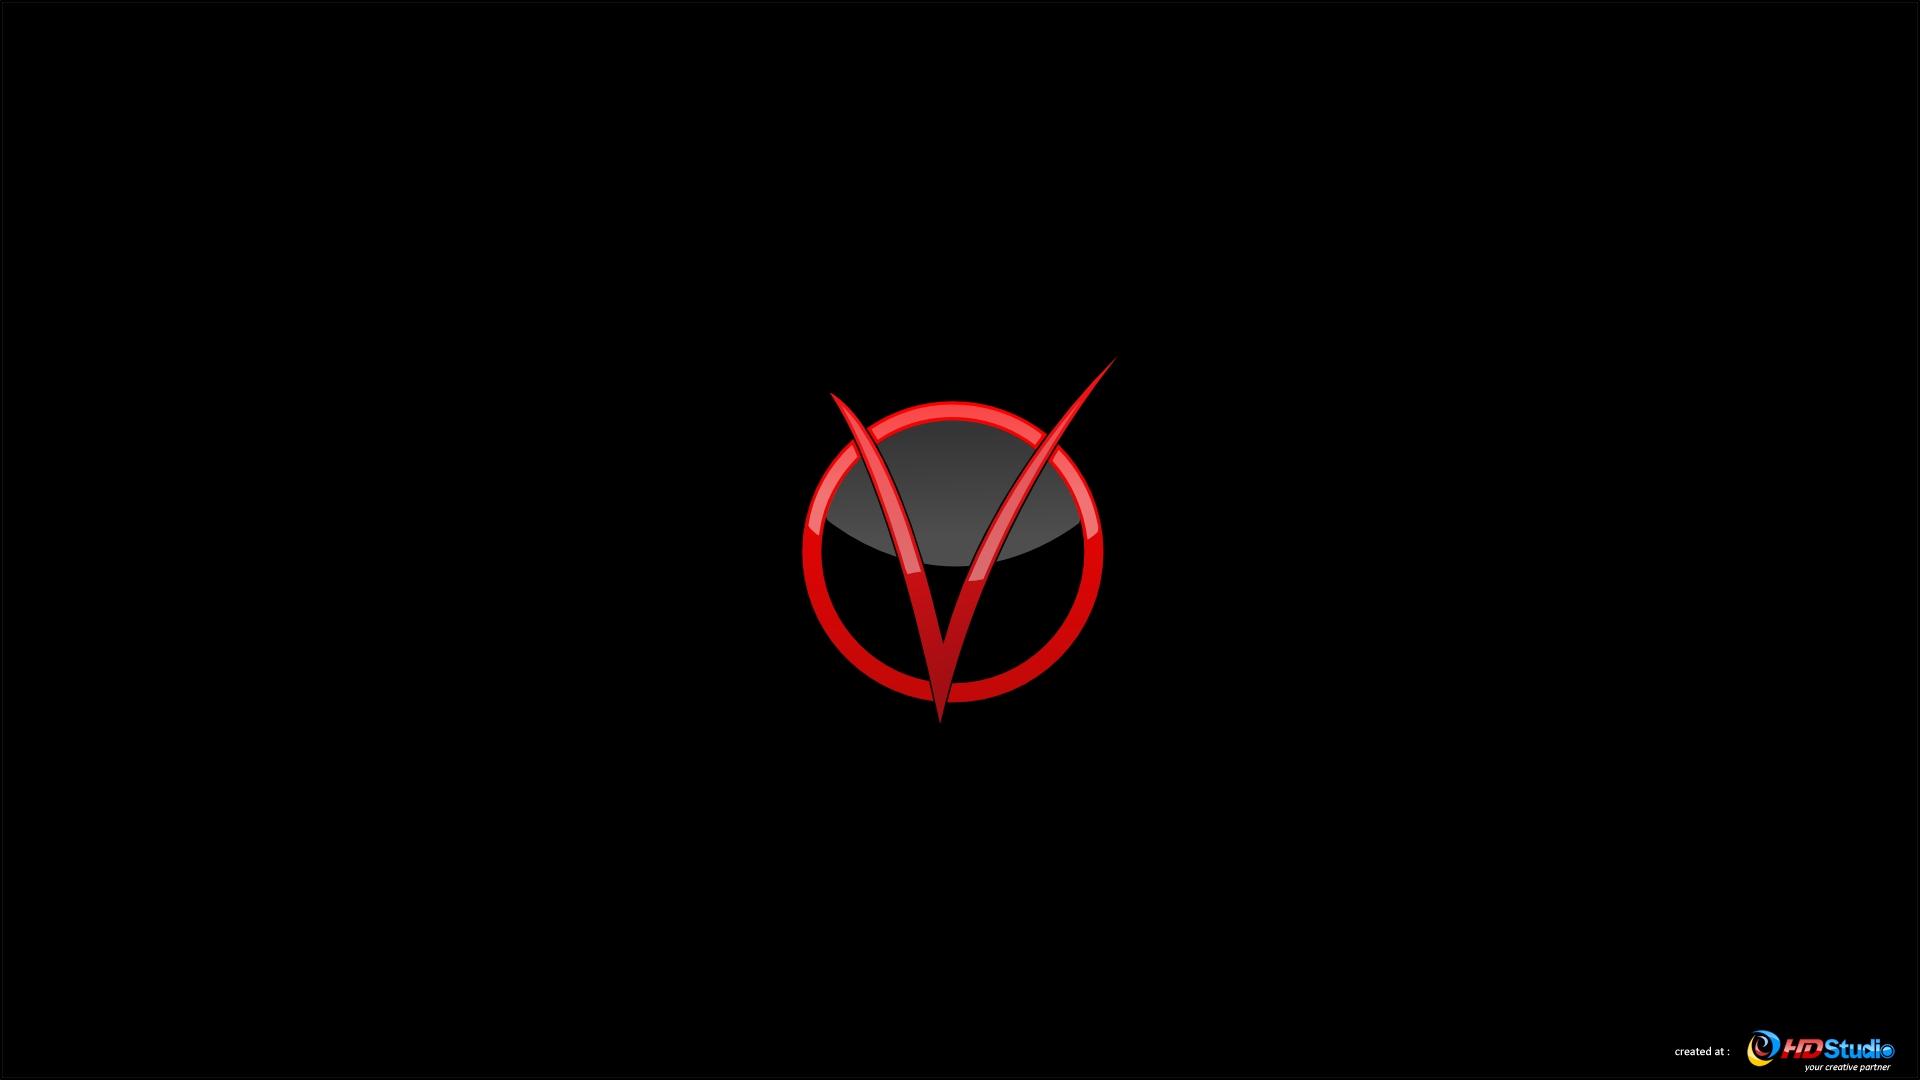 v for vendetta by hd studio desktop wallpaper